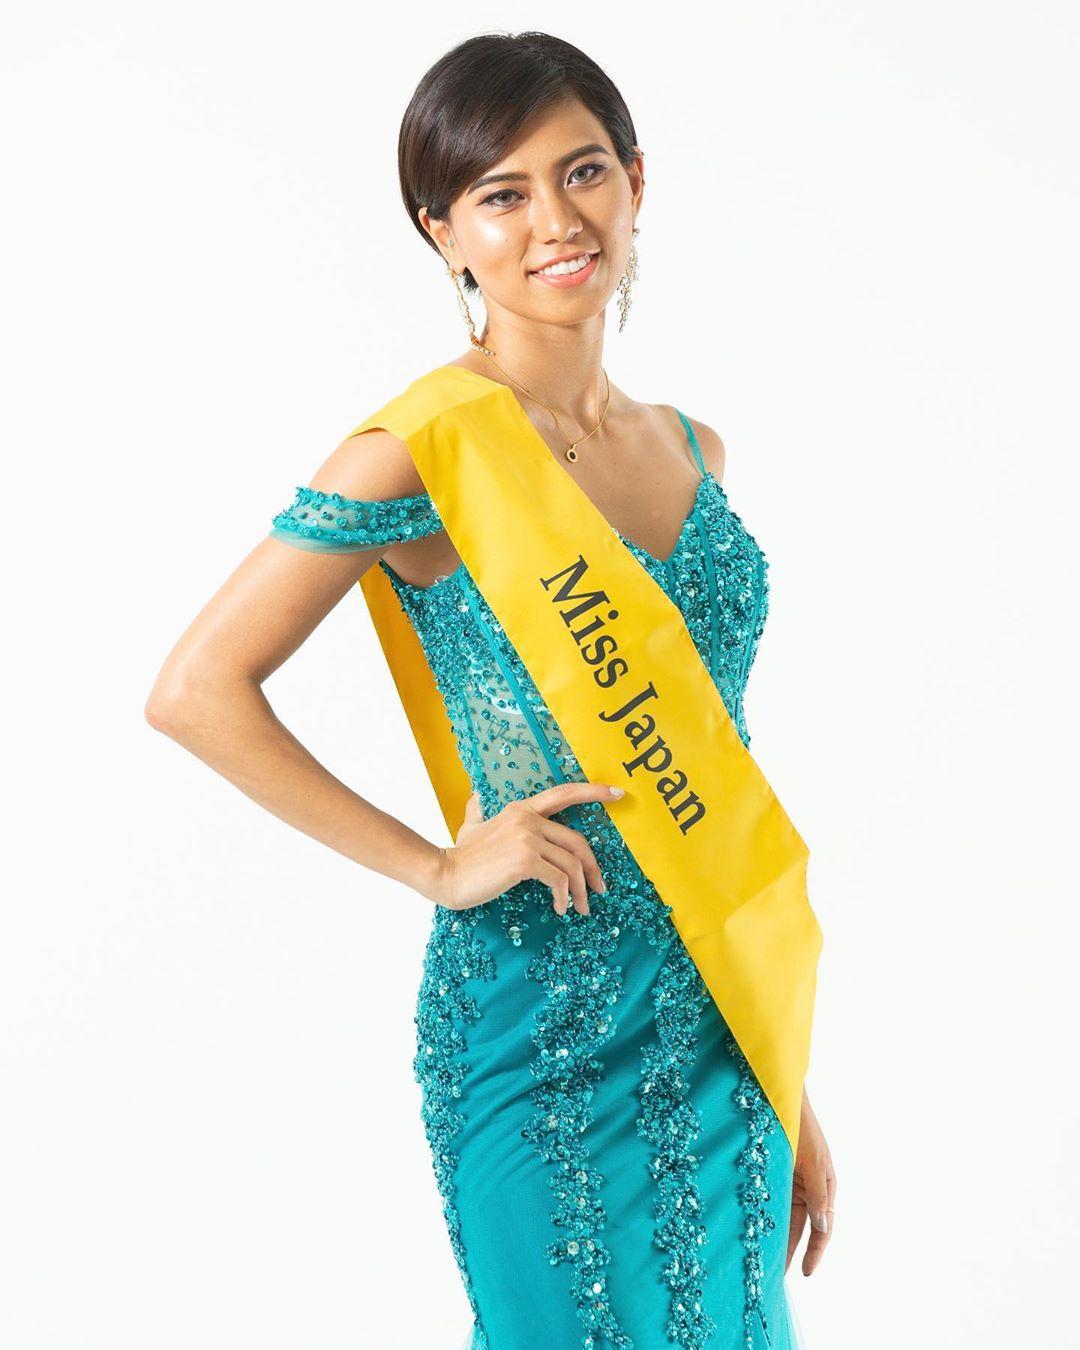 miss latvia vence miss great 2019. 1kObKG